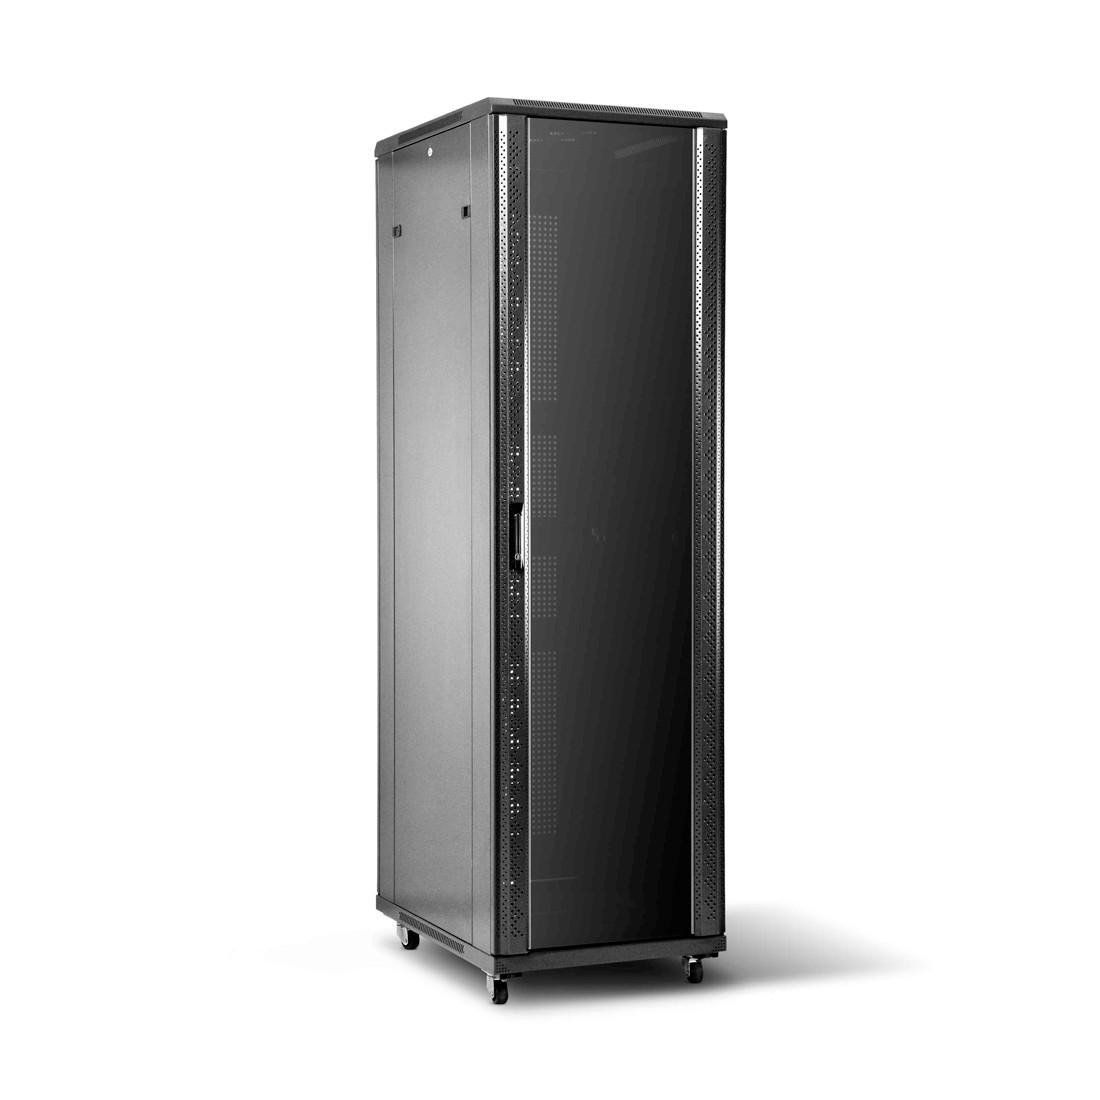 Шкаф серверный SHIP 601S.6842.24.100 42U 600*800*2000 мм